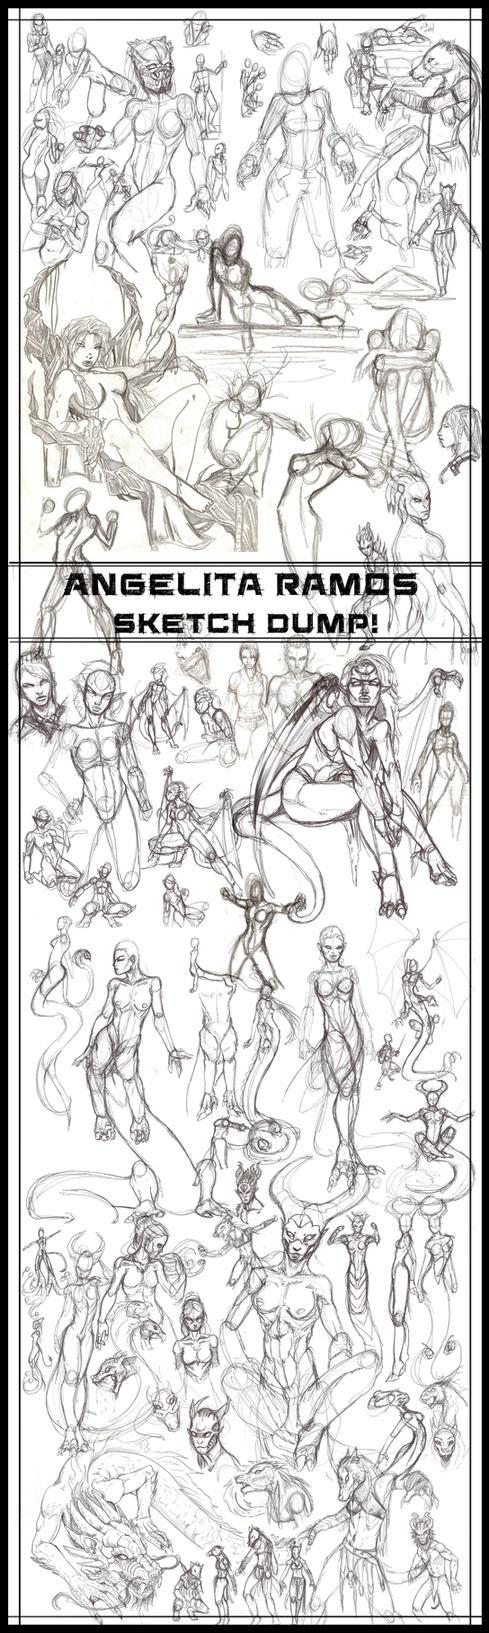 2015 Sketch Dump by AngelitaRamos